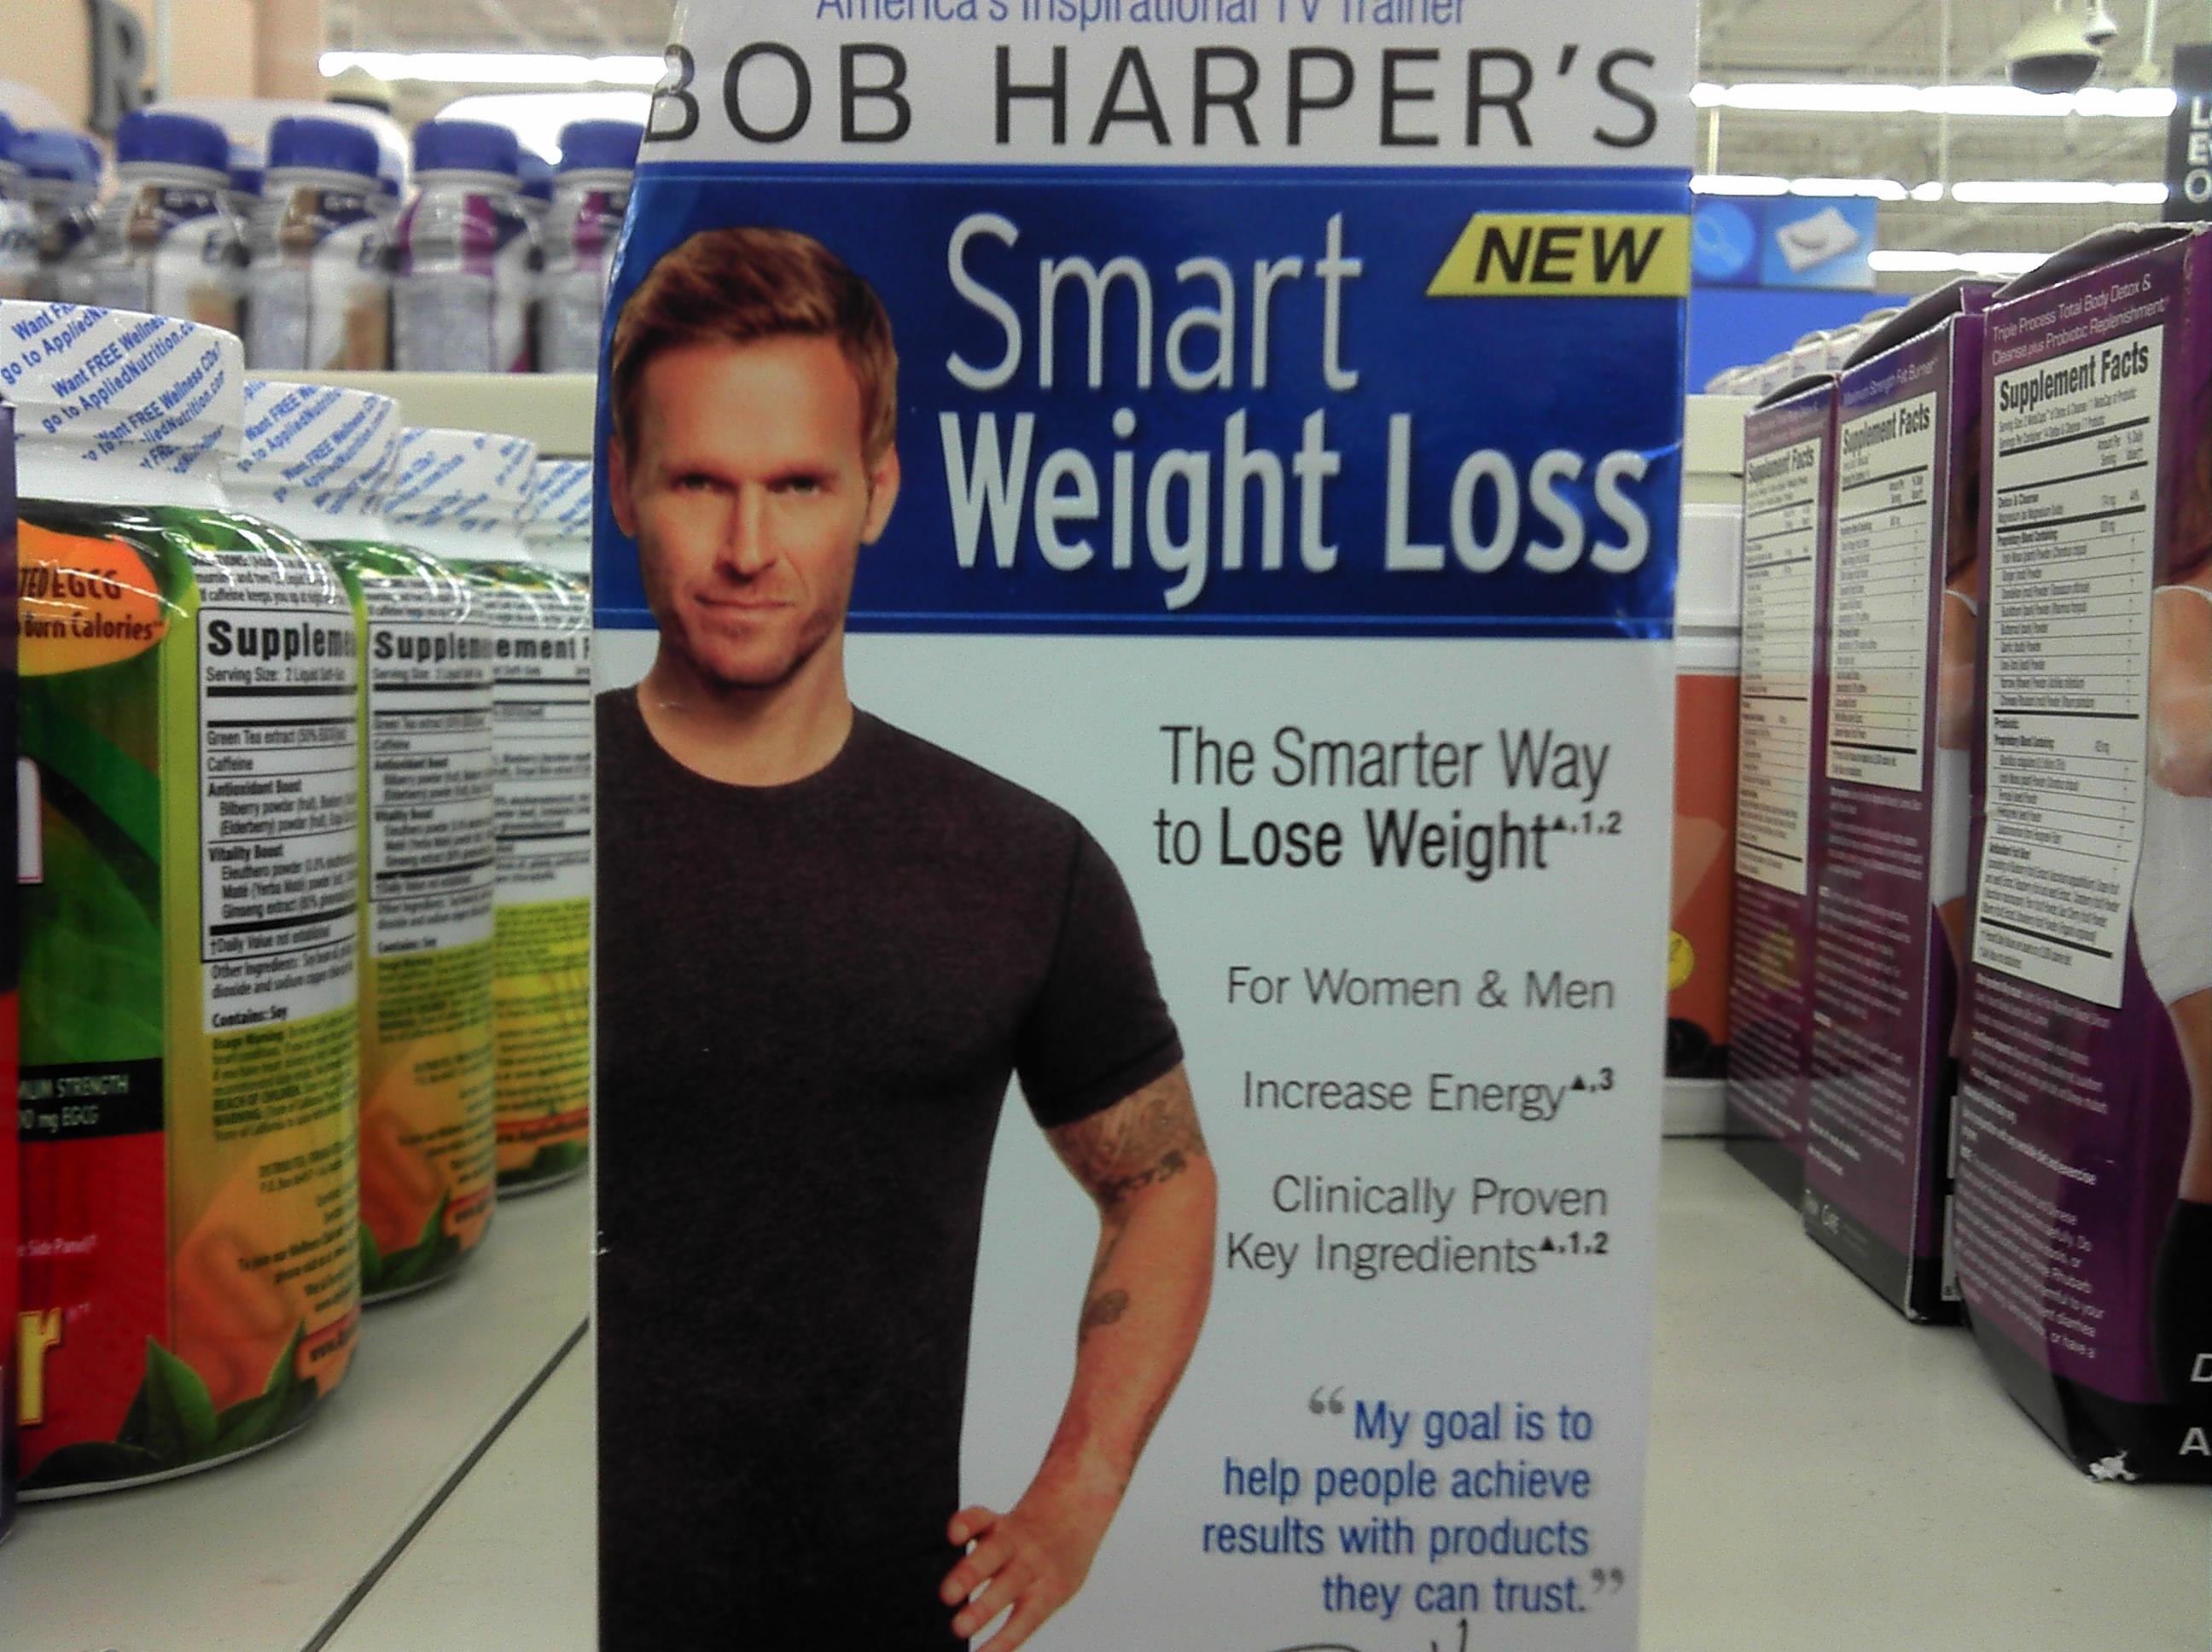 Bob Harper Smart Weight Loss Review Supplement Clarity